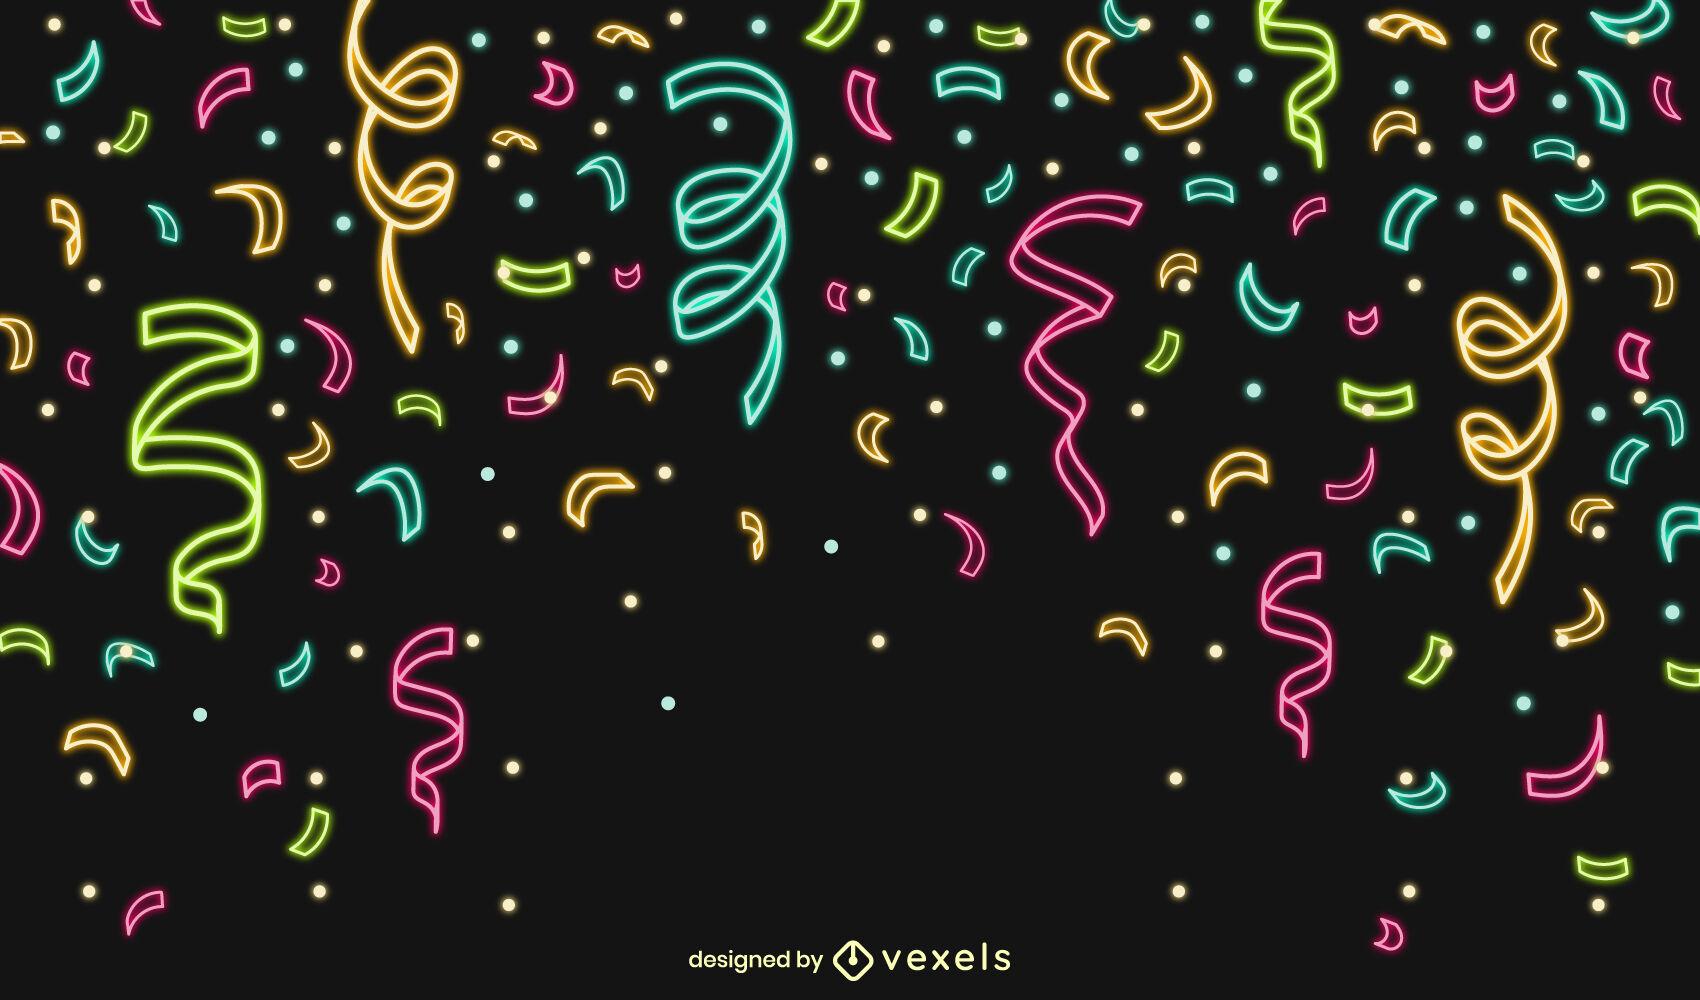 Diseño de fondo de neón de celebración de confeti